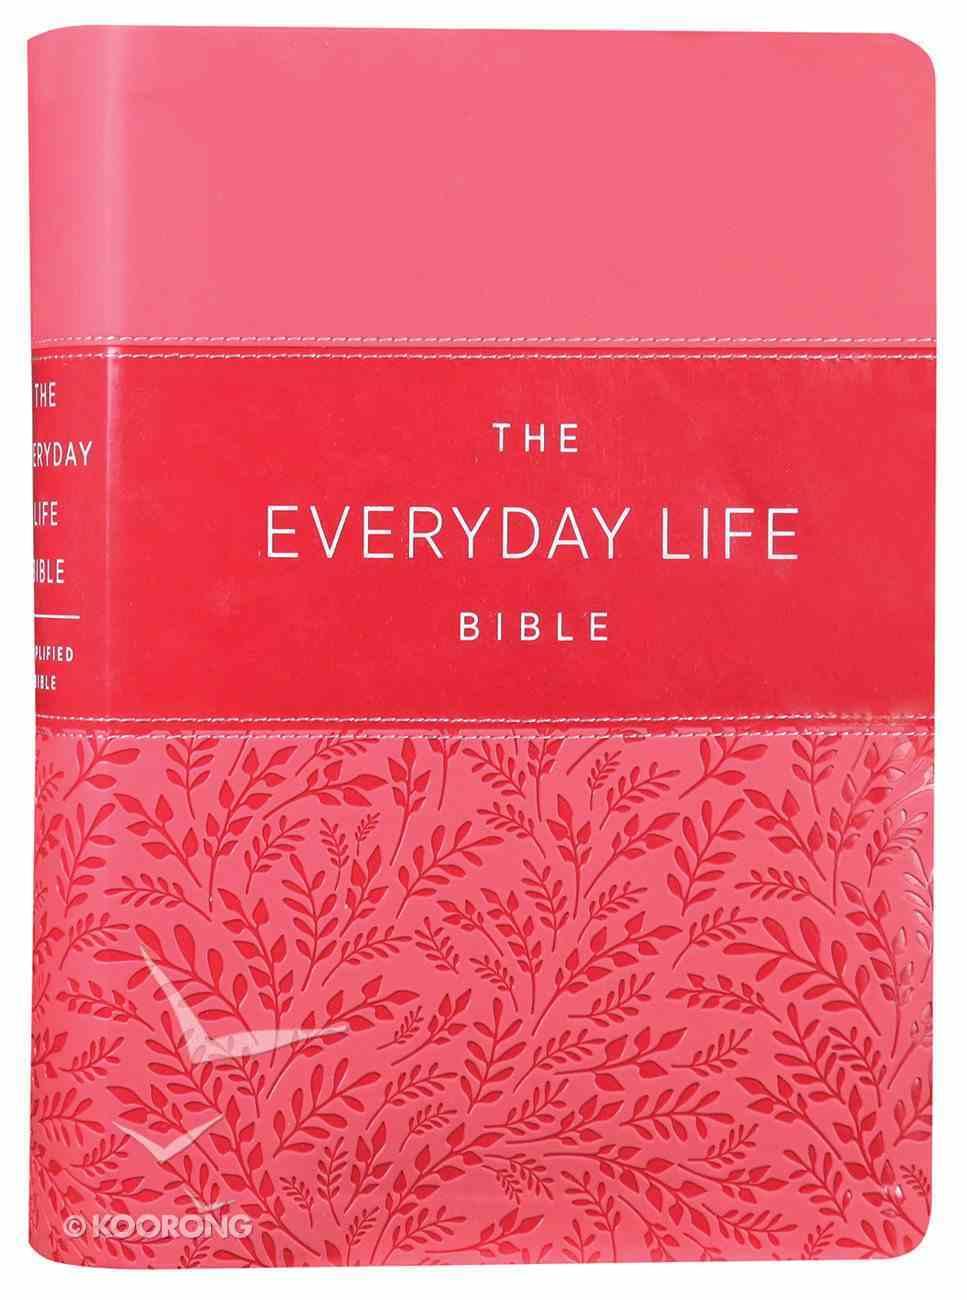 Amplified Joyce Meyer New Everyday Life Bible Pink Imitation Leather